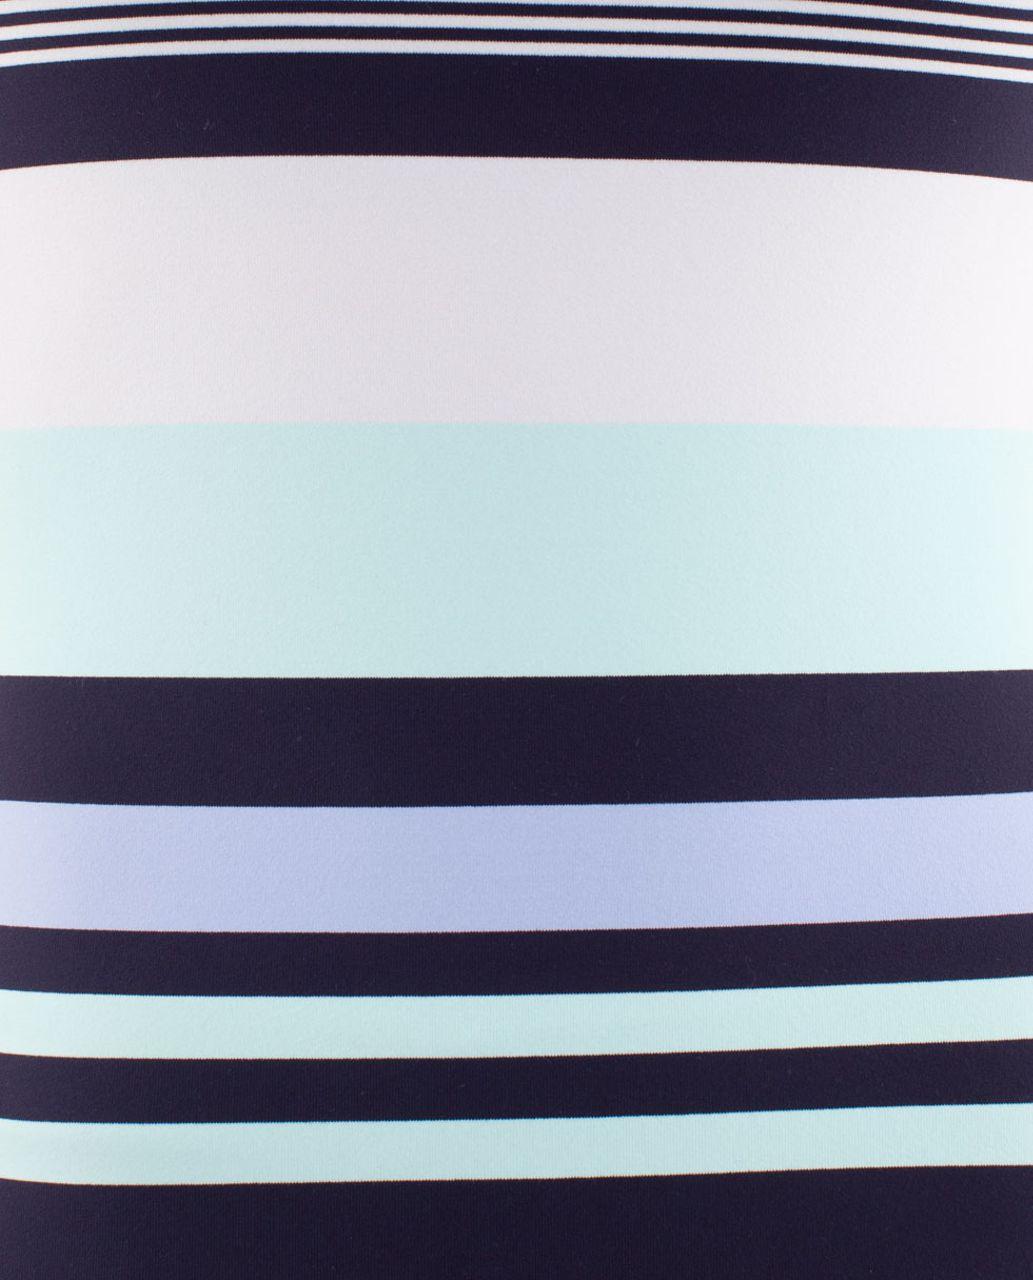 Lululemon Power Y Tank - Discover Stripe White Deep Indigo /  Deep Indigo